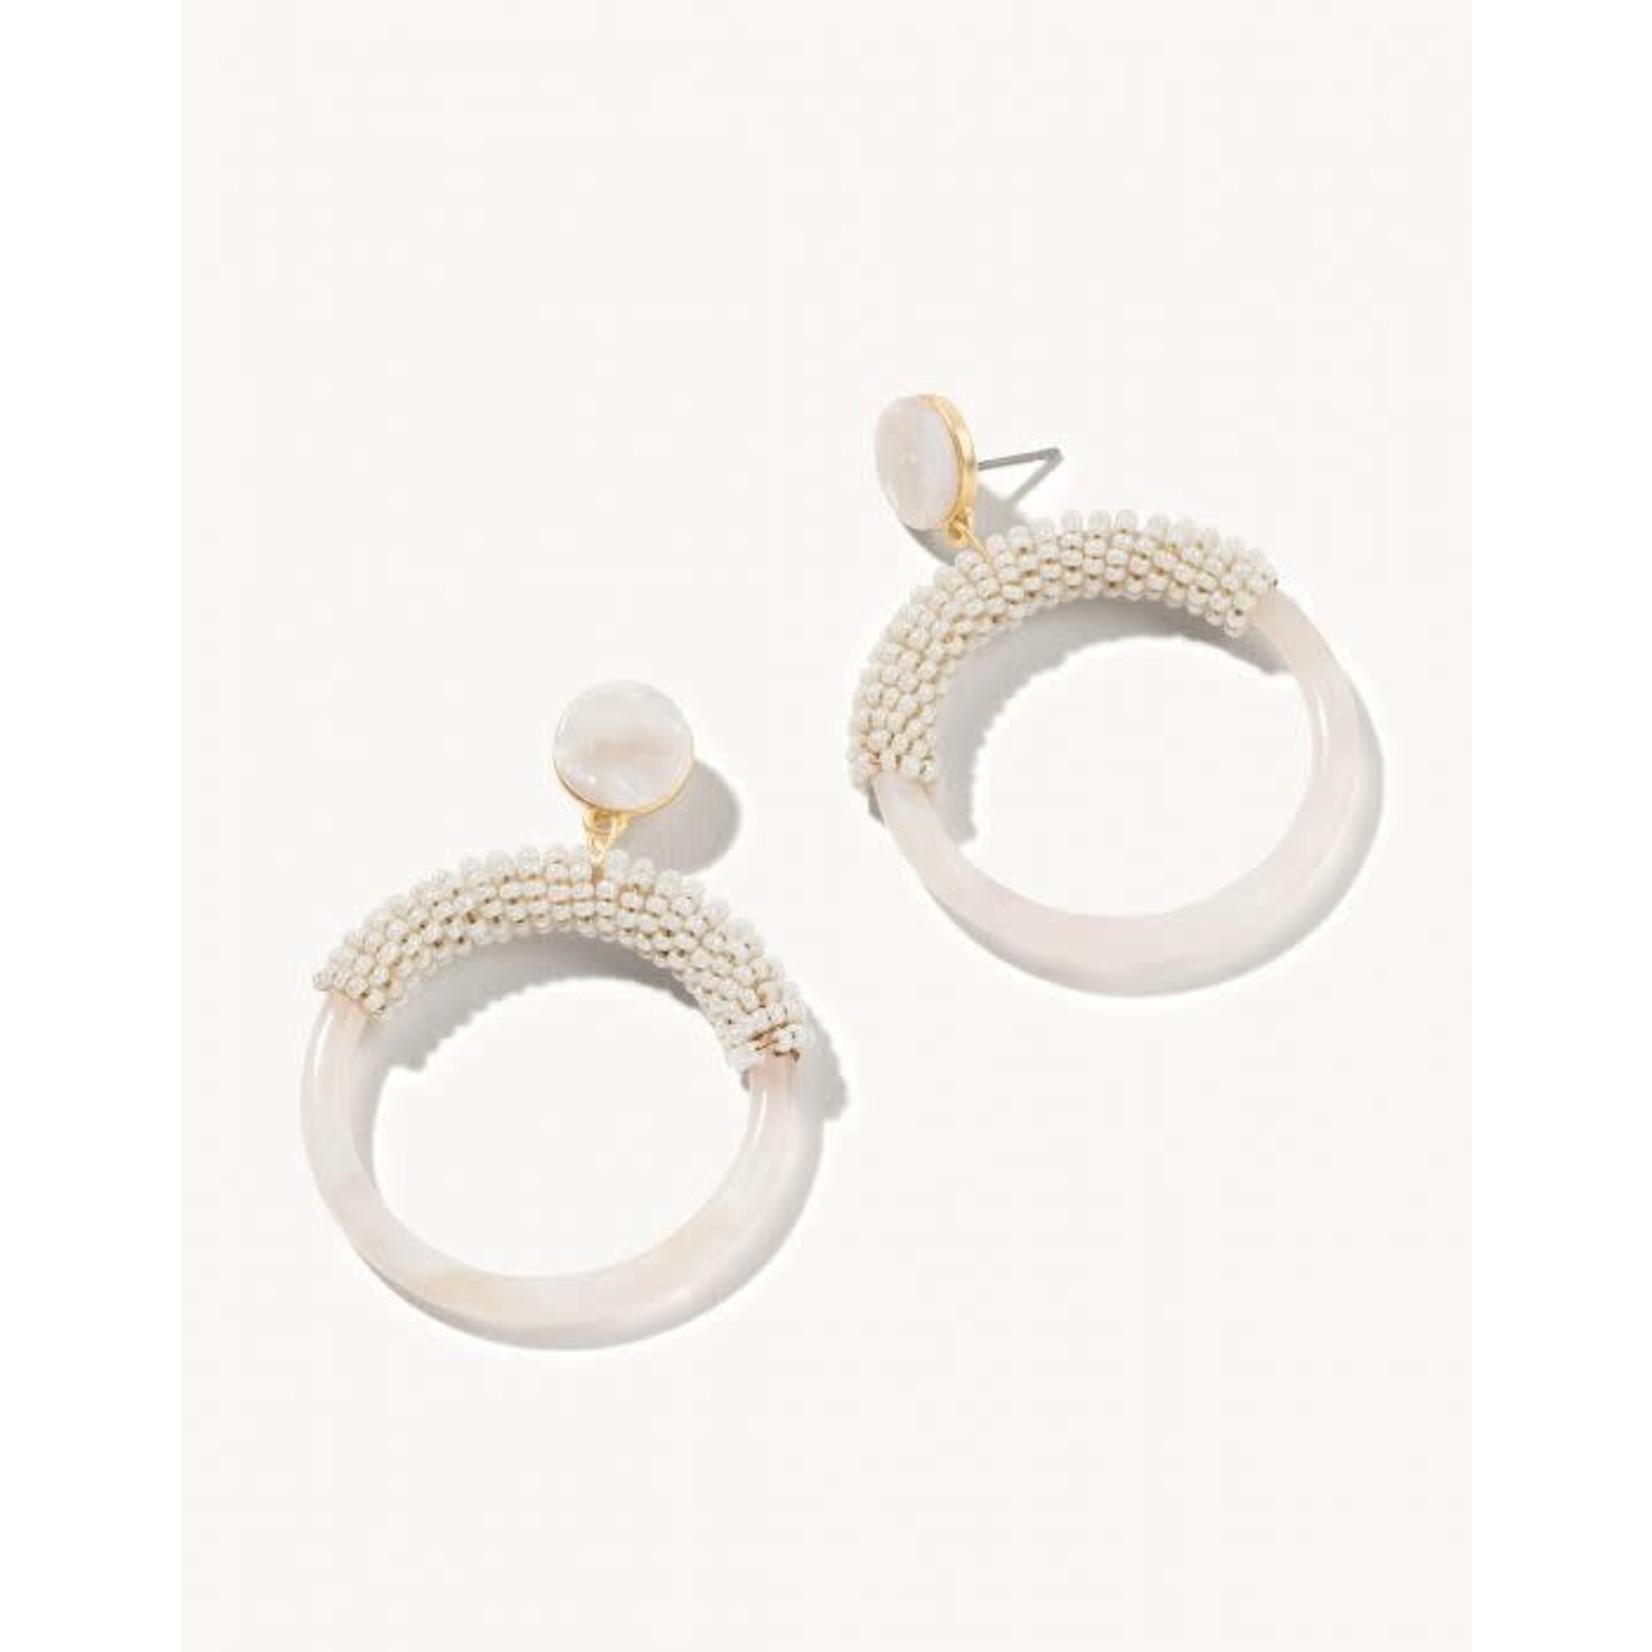 Spartina 65794 Earrings/Beaded Circle Cream